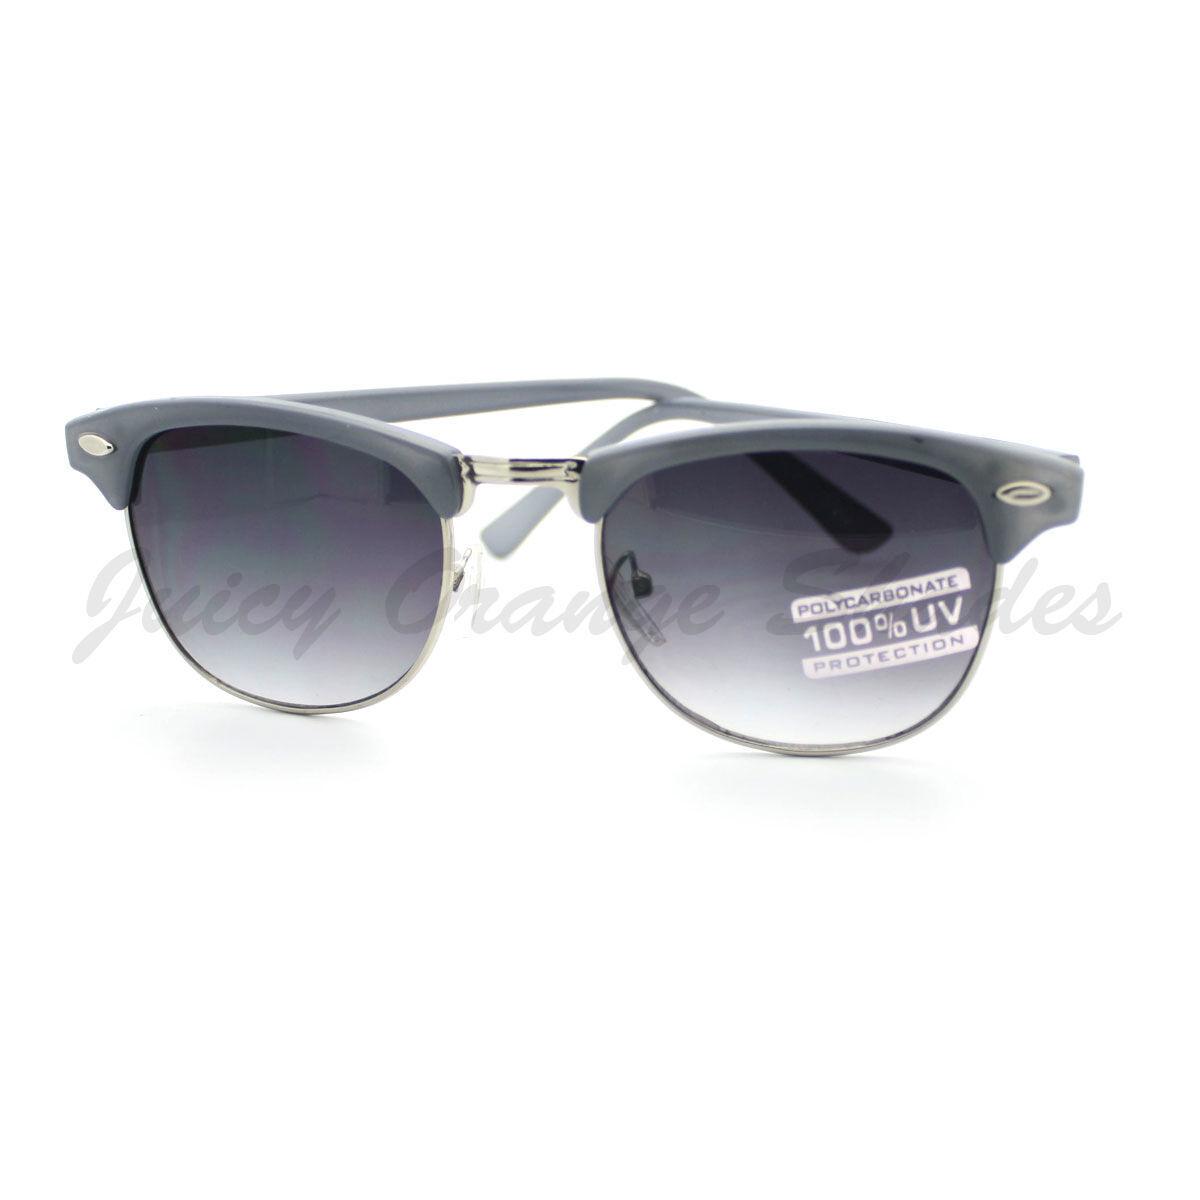 Womens Fashion Sunglasses Petite Half Round Rim Vintage Keyhole Frame